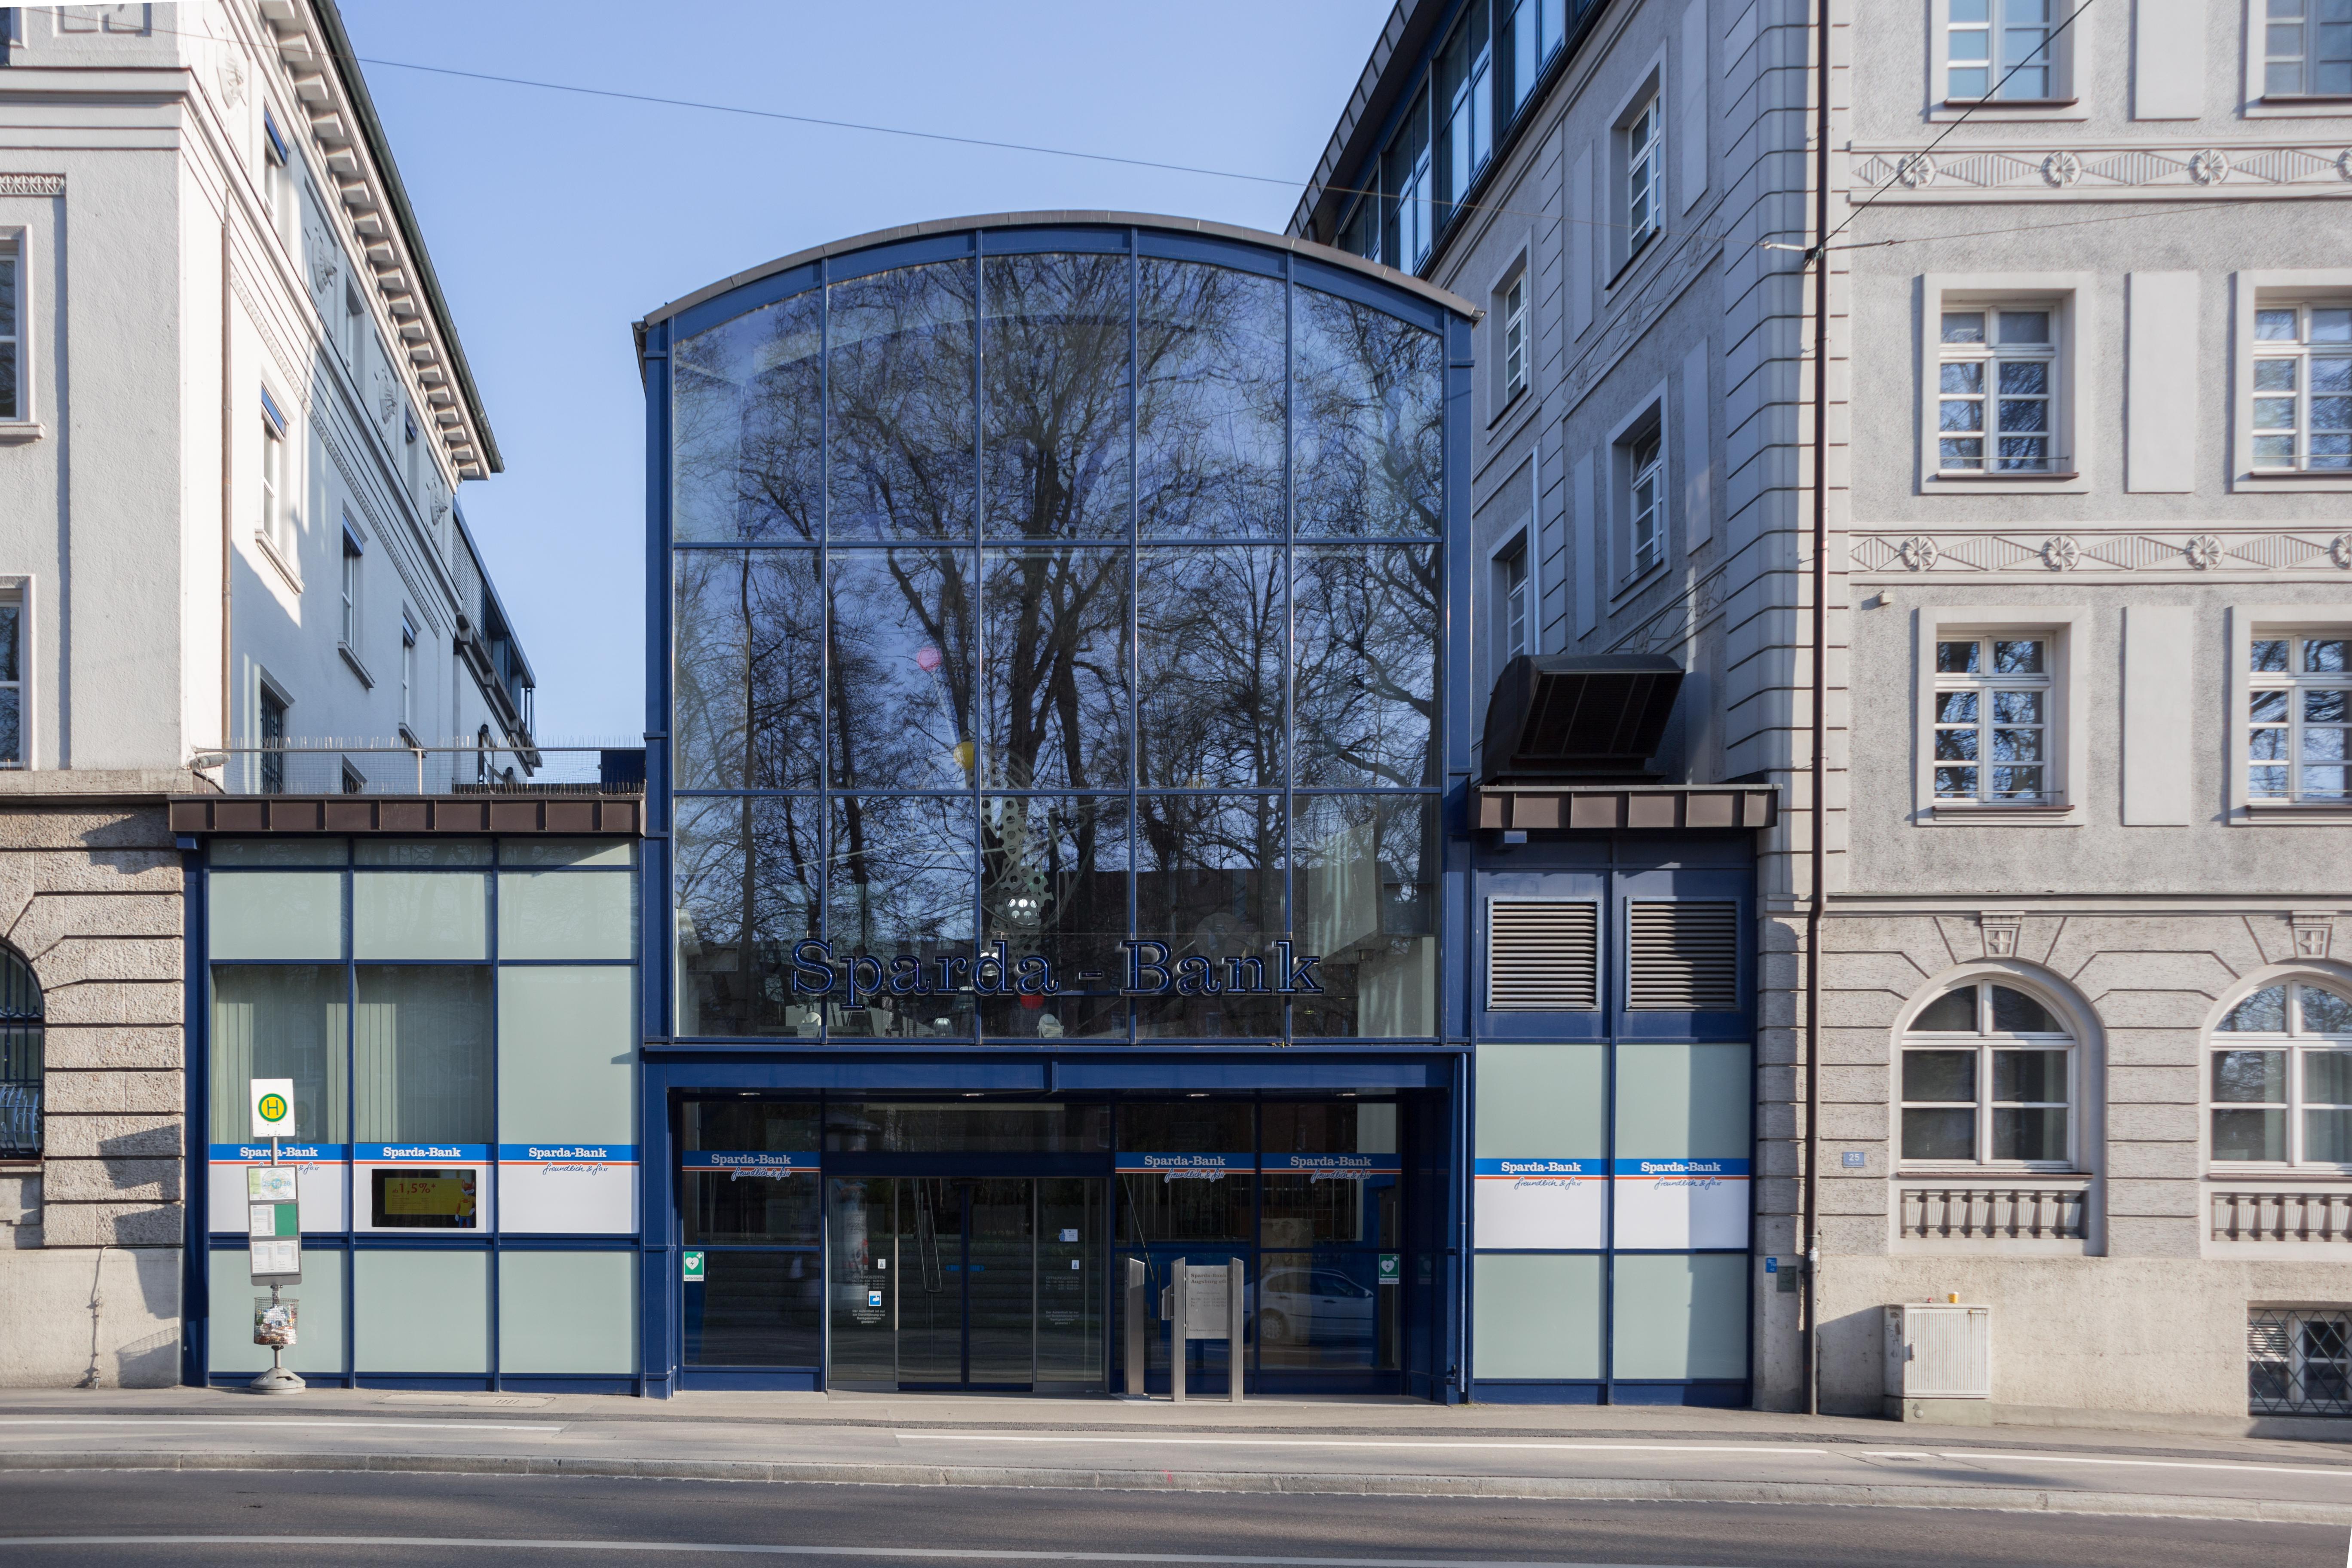 File:Sparda-Bank Augsburg - Main entrance.jpg - Wikimedia Commons on